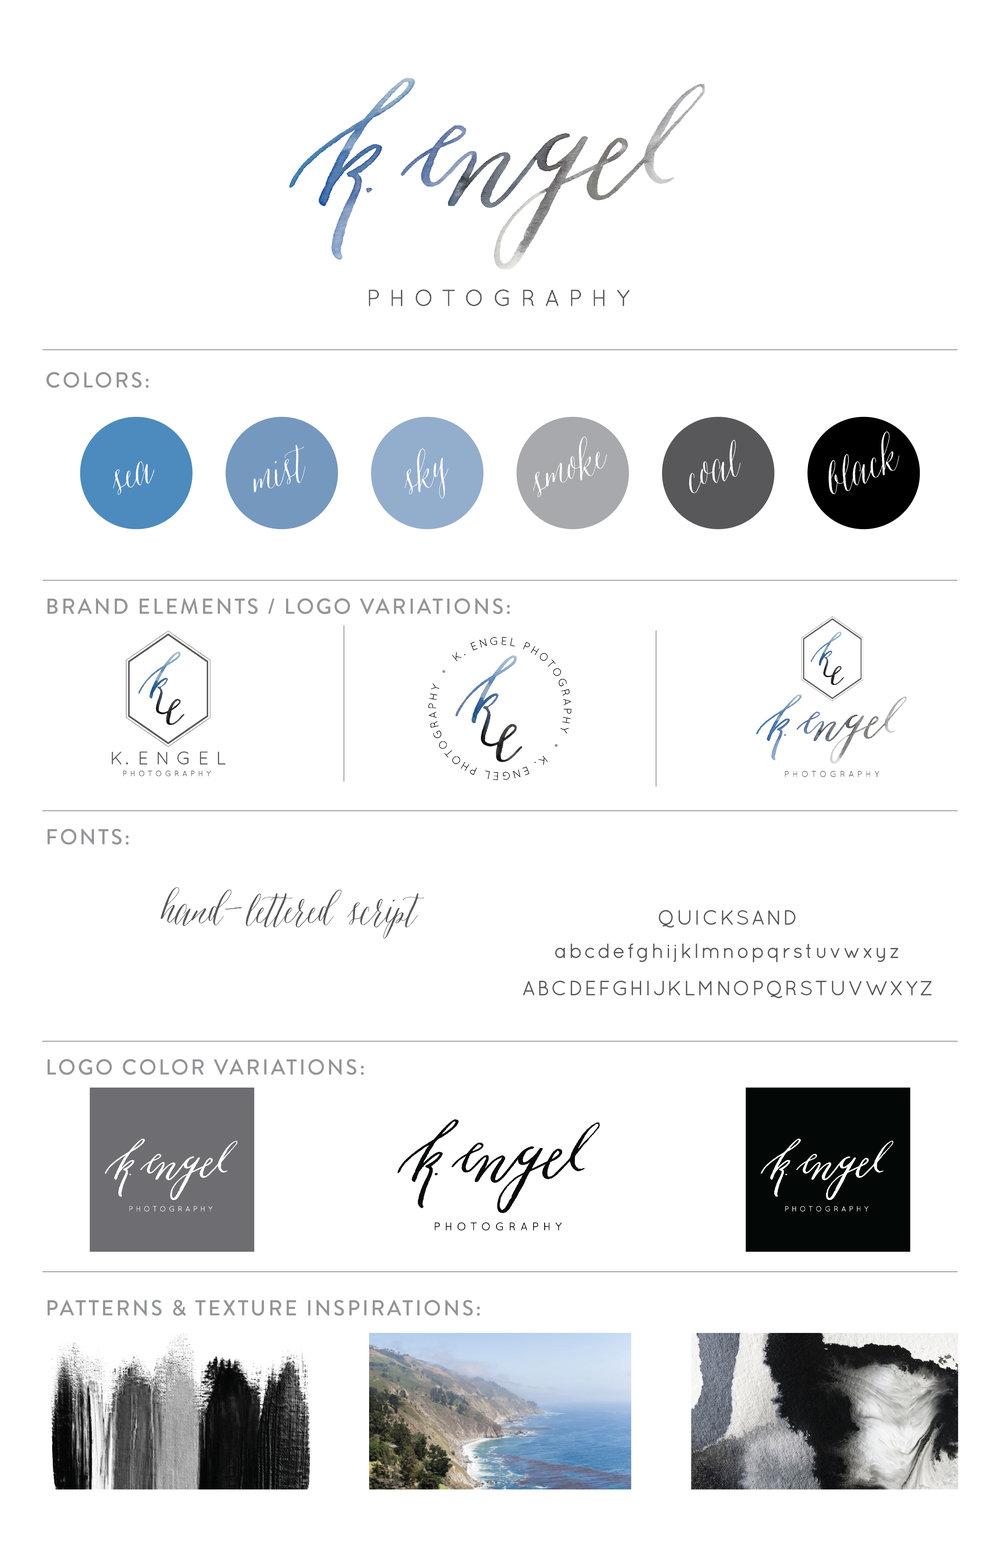 Sable and Gray - K. Engel branding board